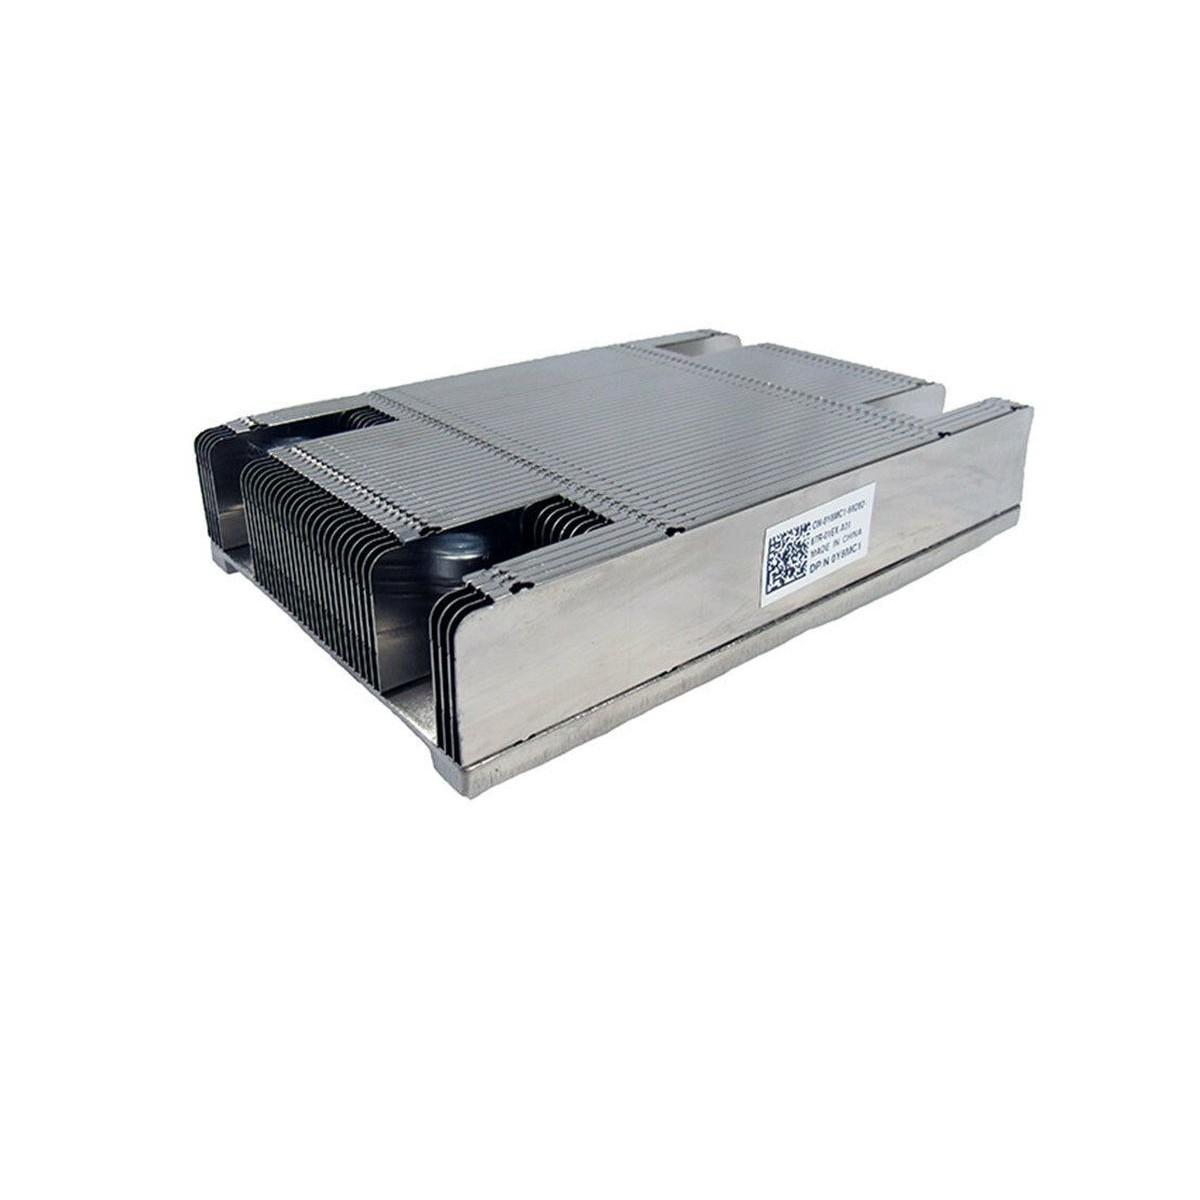 RADIATOR HEATSINK DELL POWEREDGE 1900 2900 0KC038